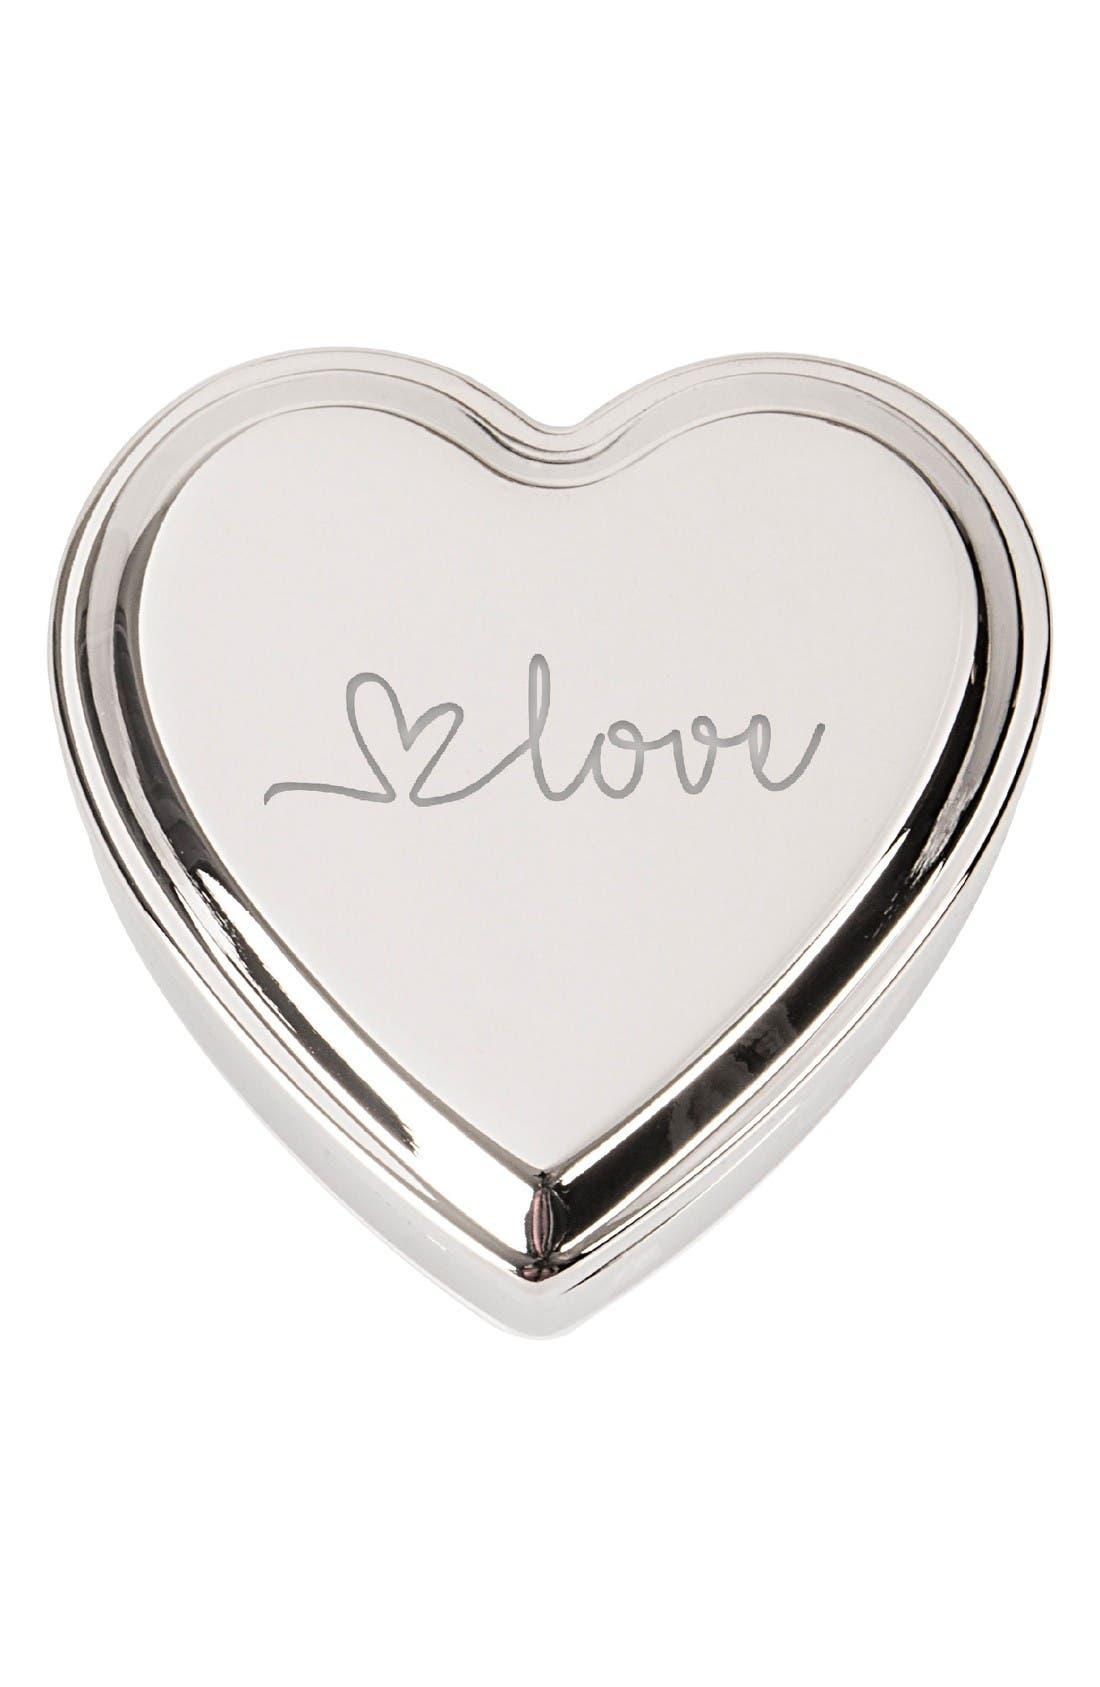 Love Heart Keepsake Box,                         Main,                         color, Silver